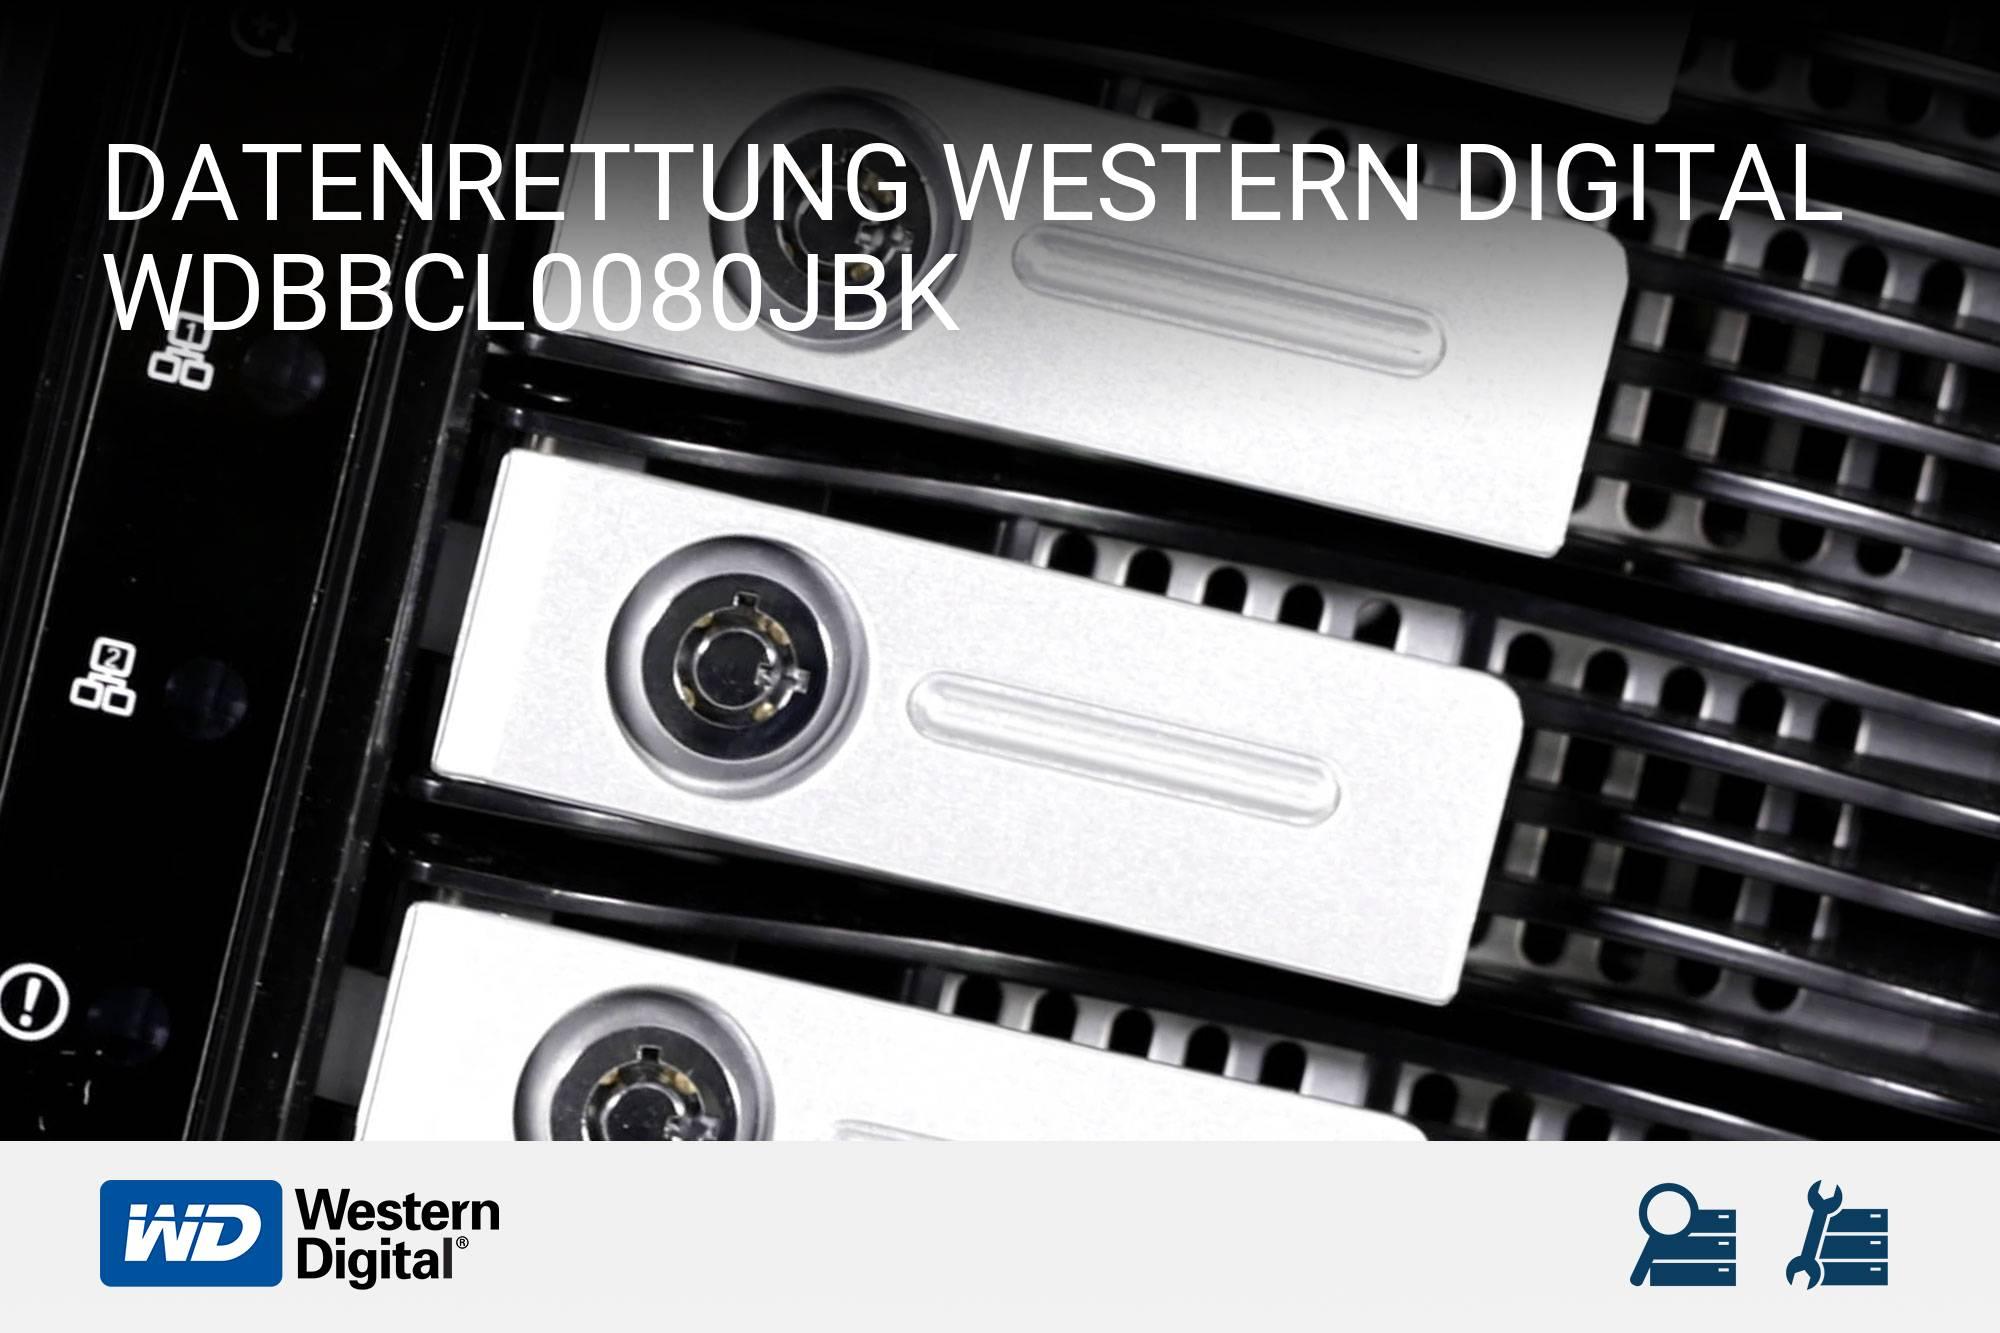 Western Digital WDBBCL0080JBK